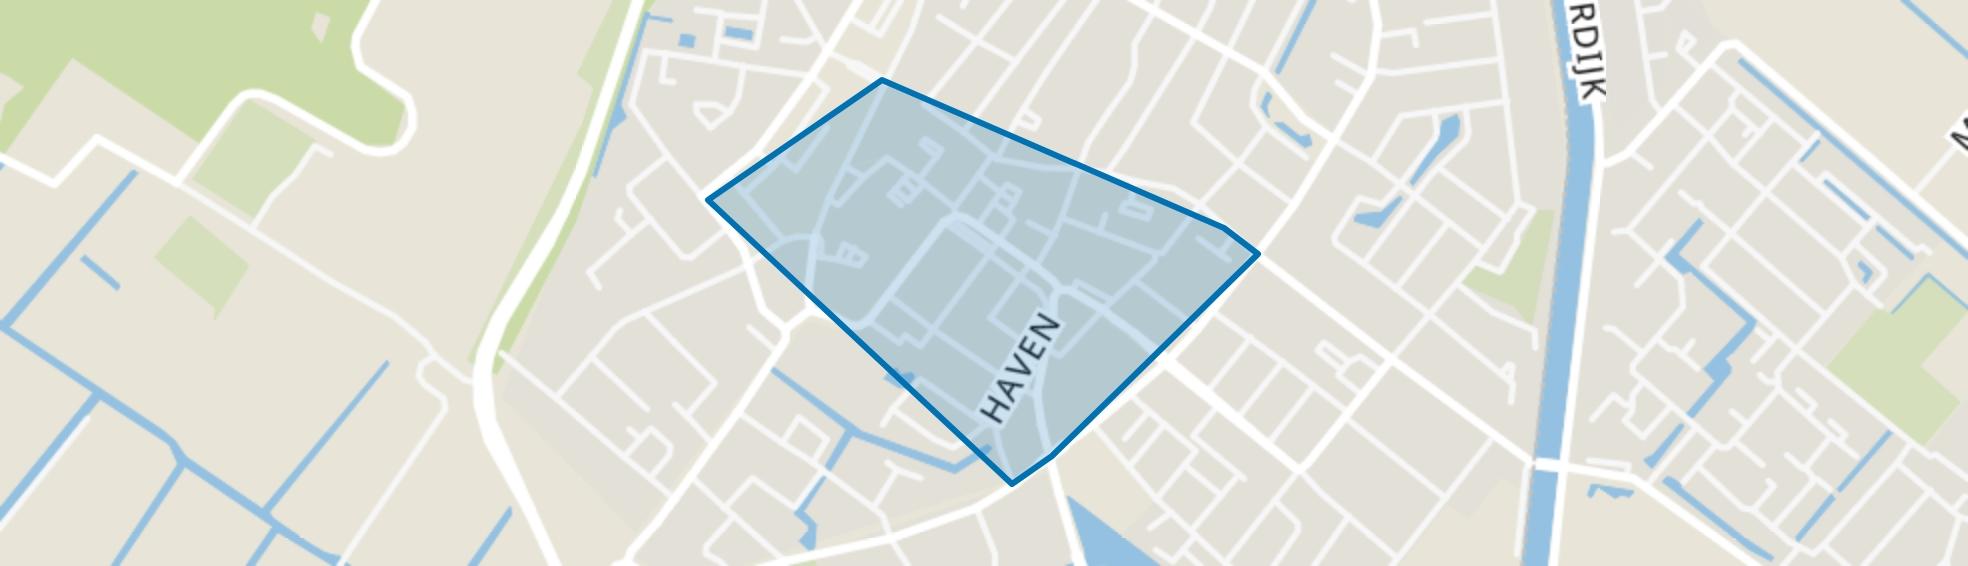 Het Vierkant, Lisse map